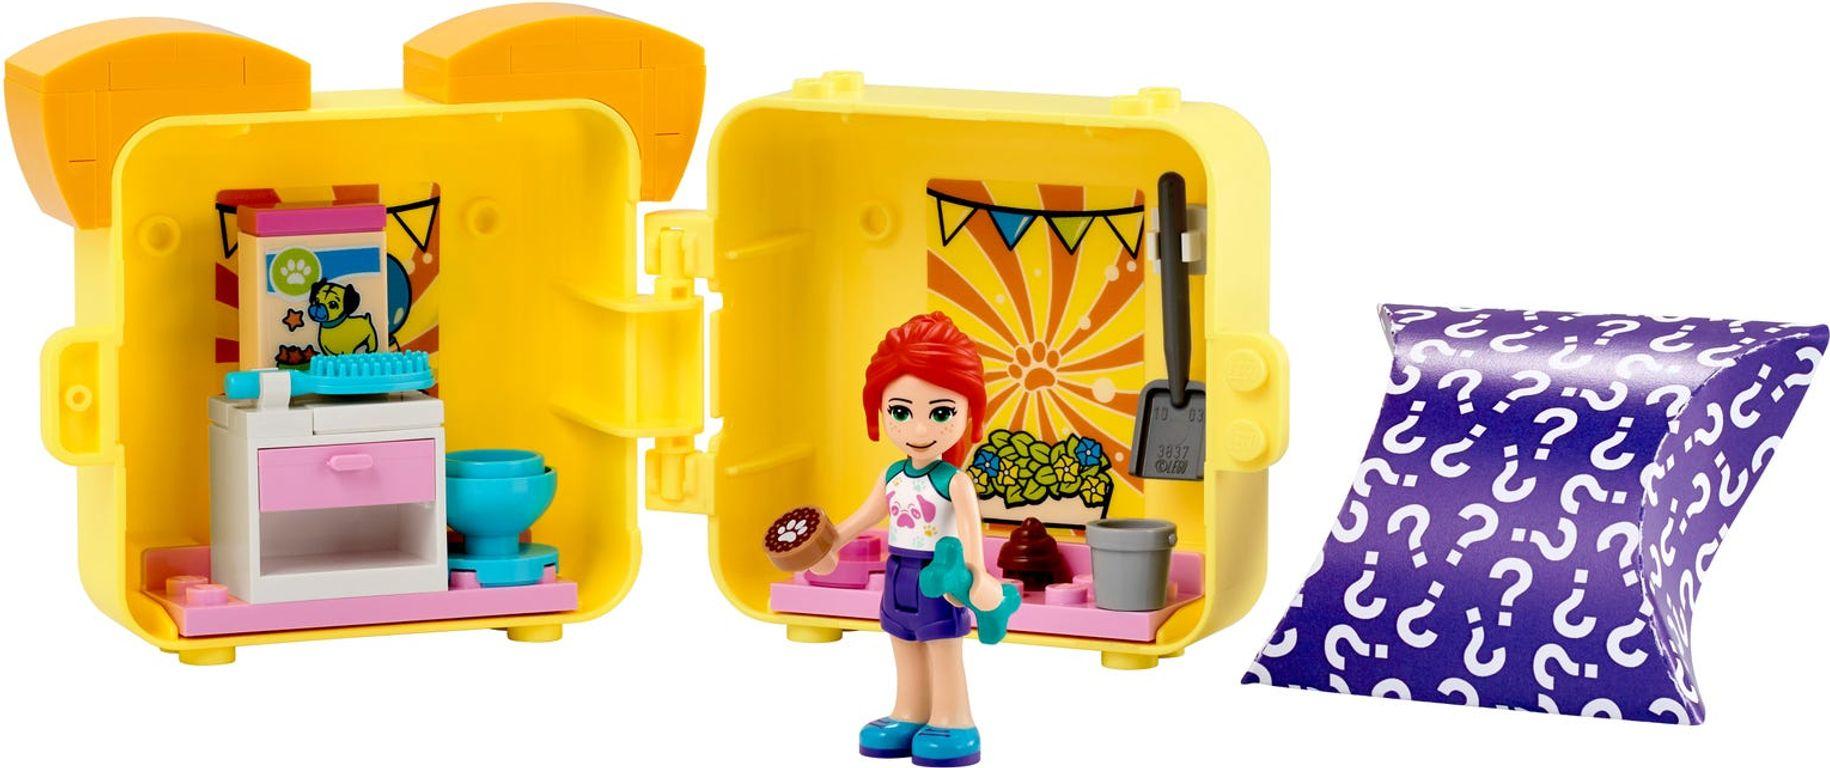 LEGO® Friends Mia's Pug Cube components